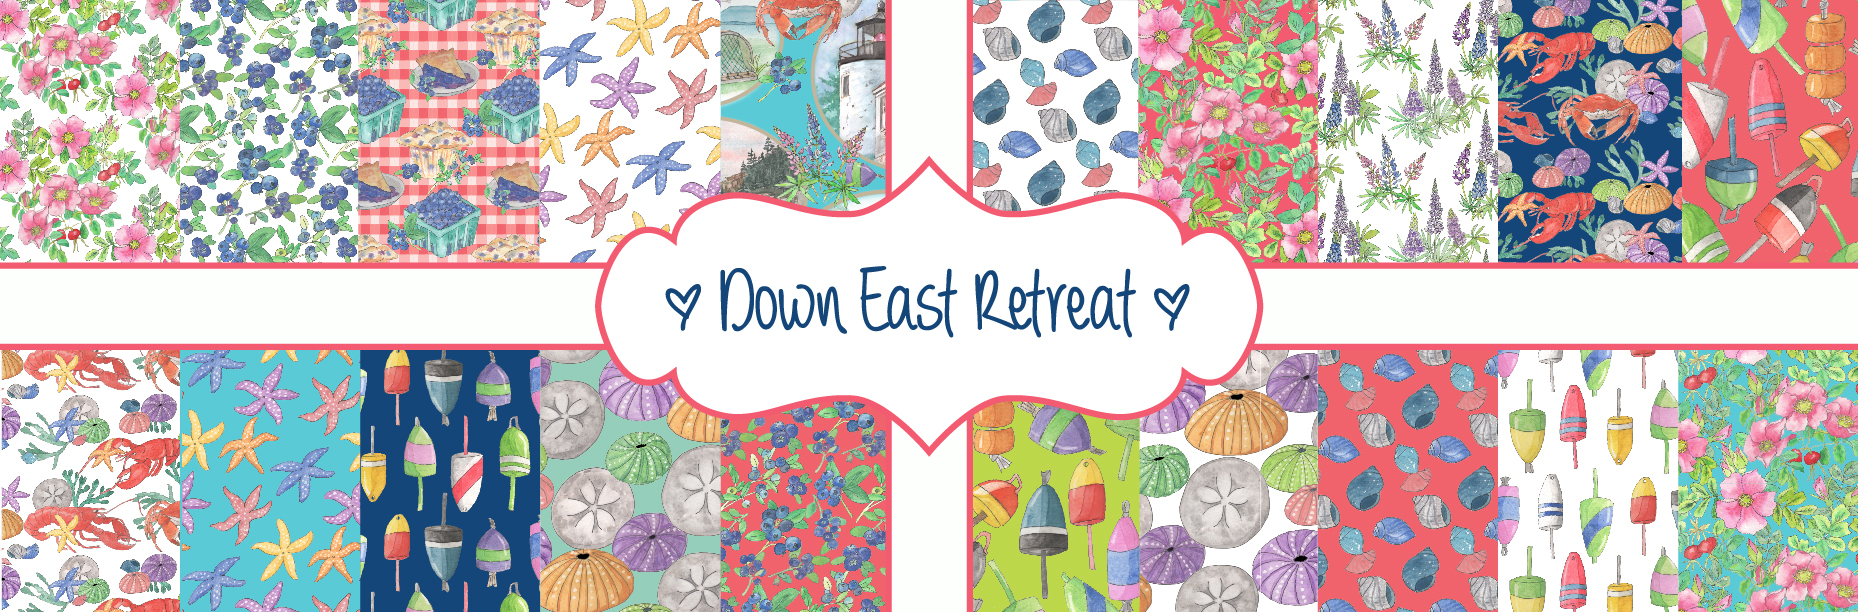 downeast retreat1-15-15